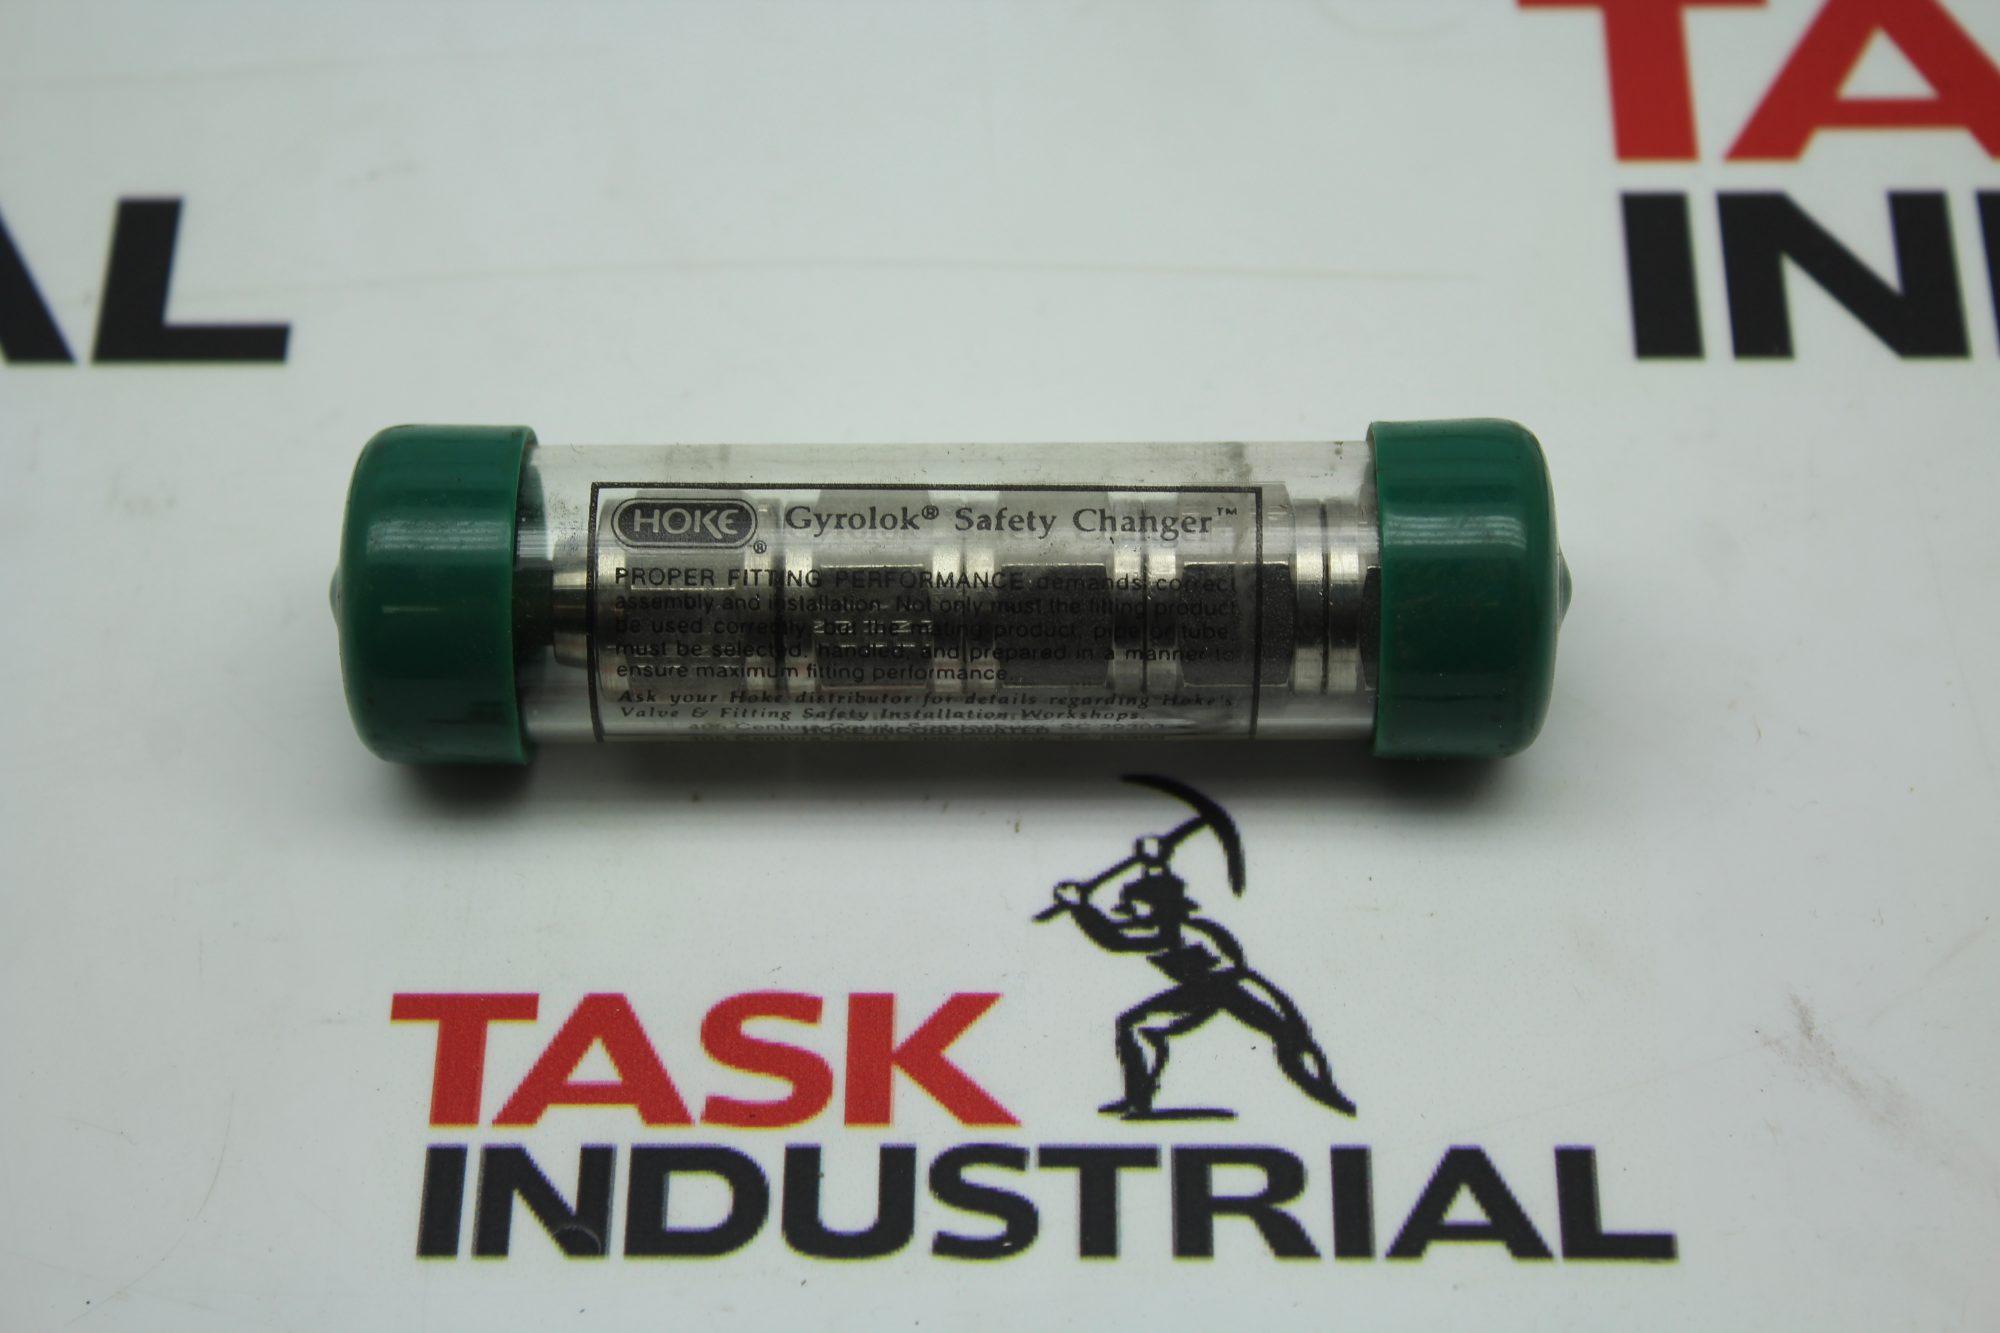 HOKE Gyrolok Safety Changer